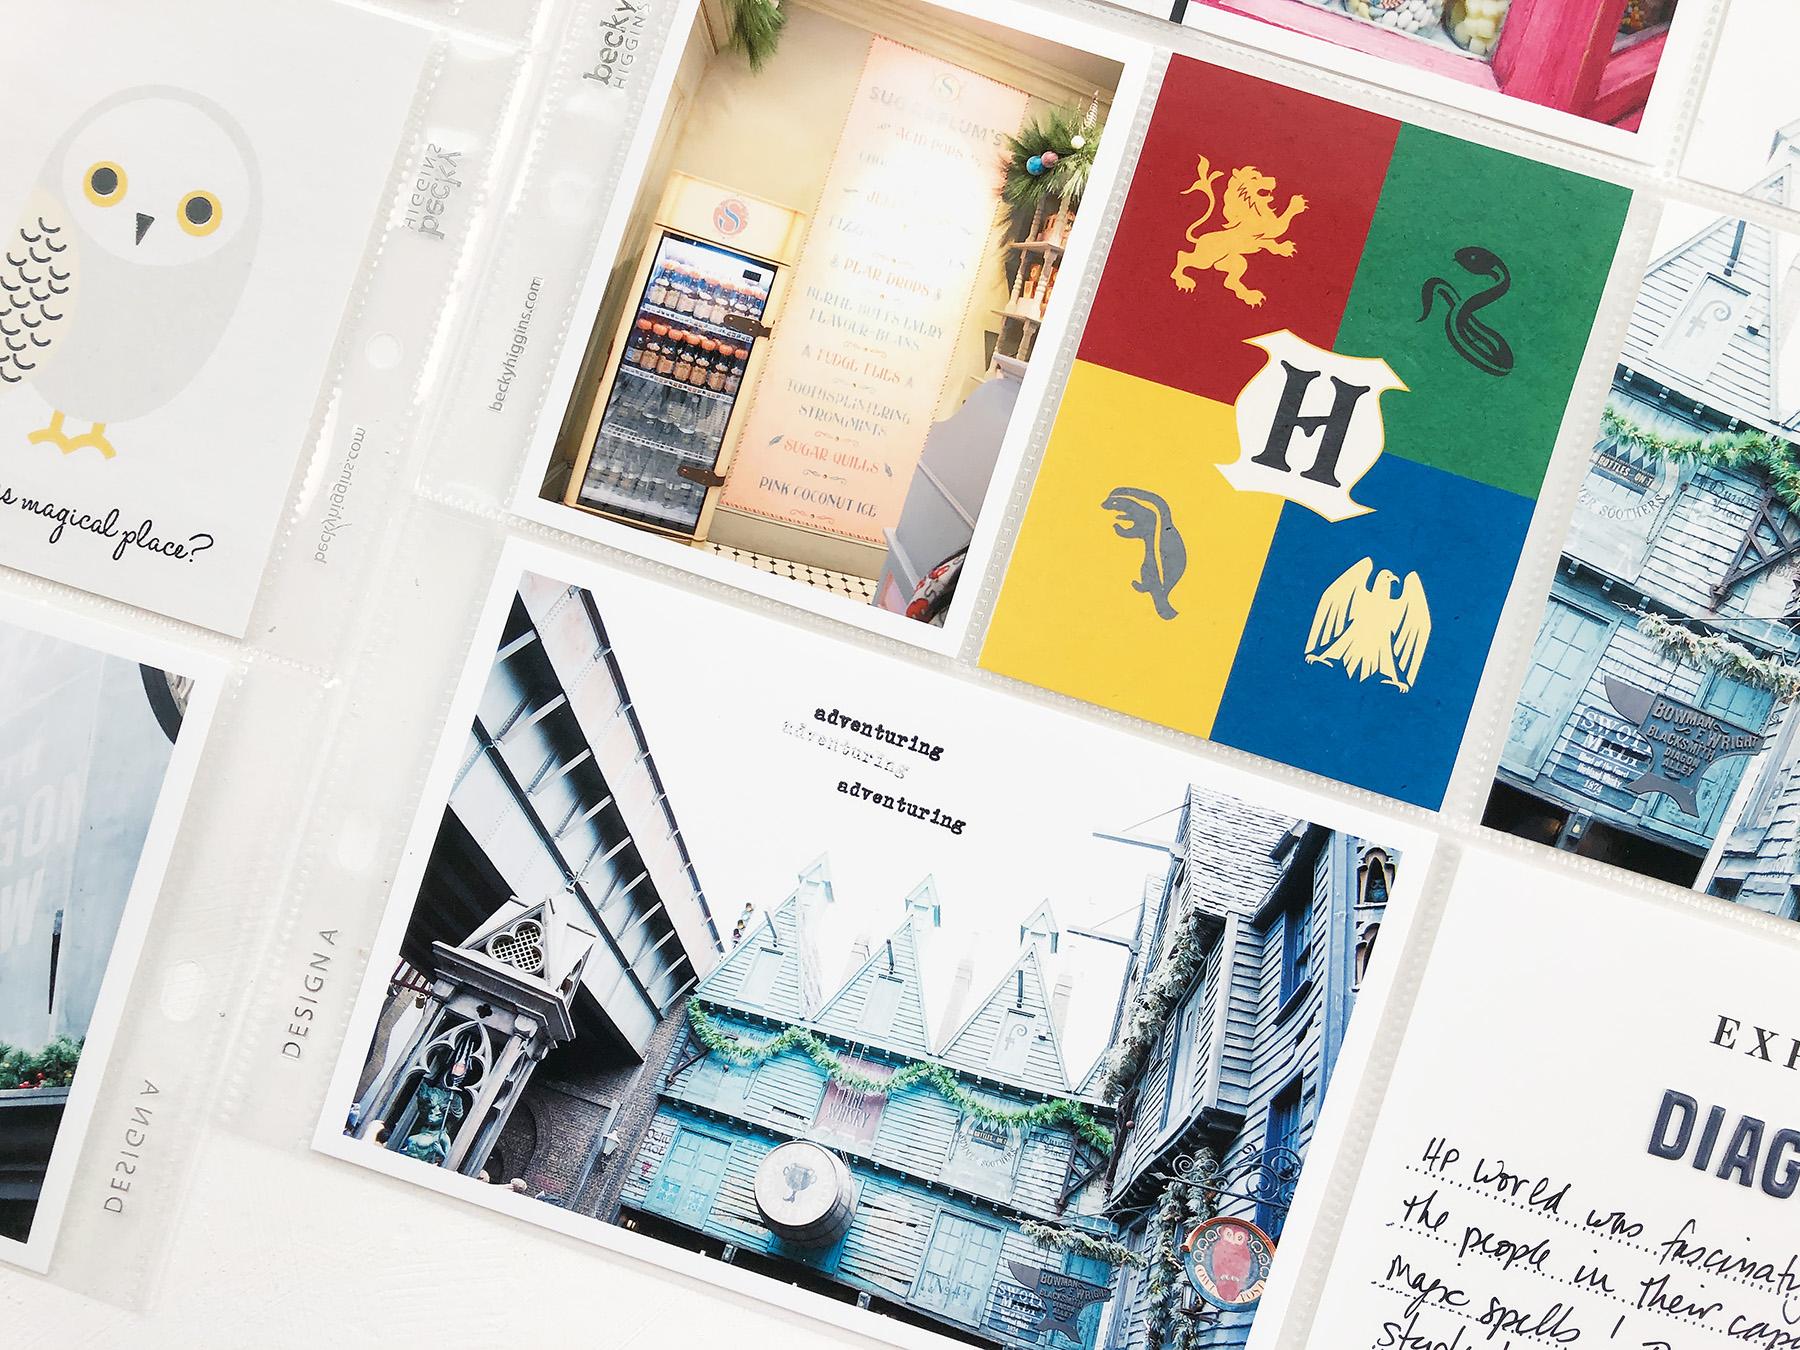 Larkindesign Disney 2020 Album | Documenting Harry Potter Diagon Alley at Universal